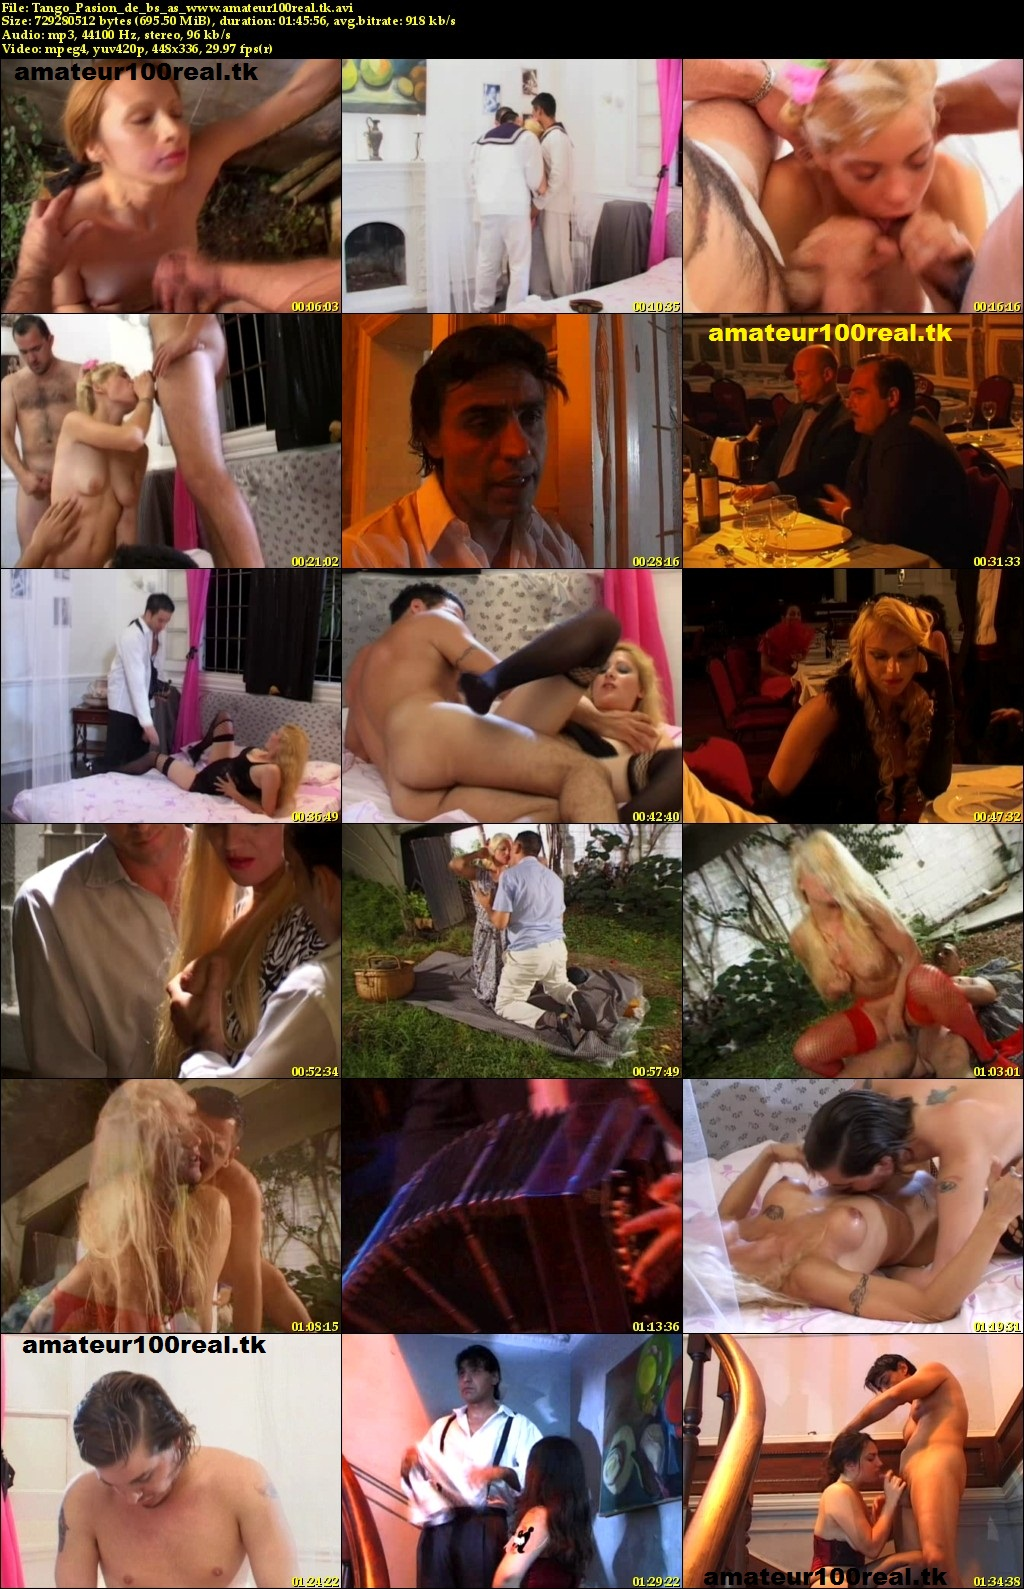 Argentina Pelicula Porno tango pasion de buenos aires xxx (español) peli argentina